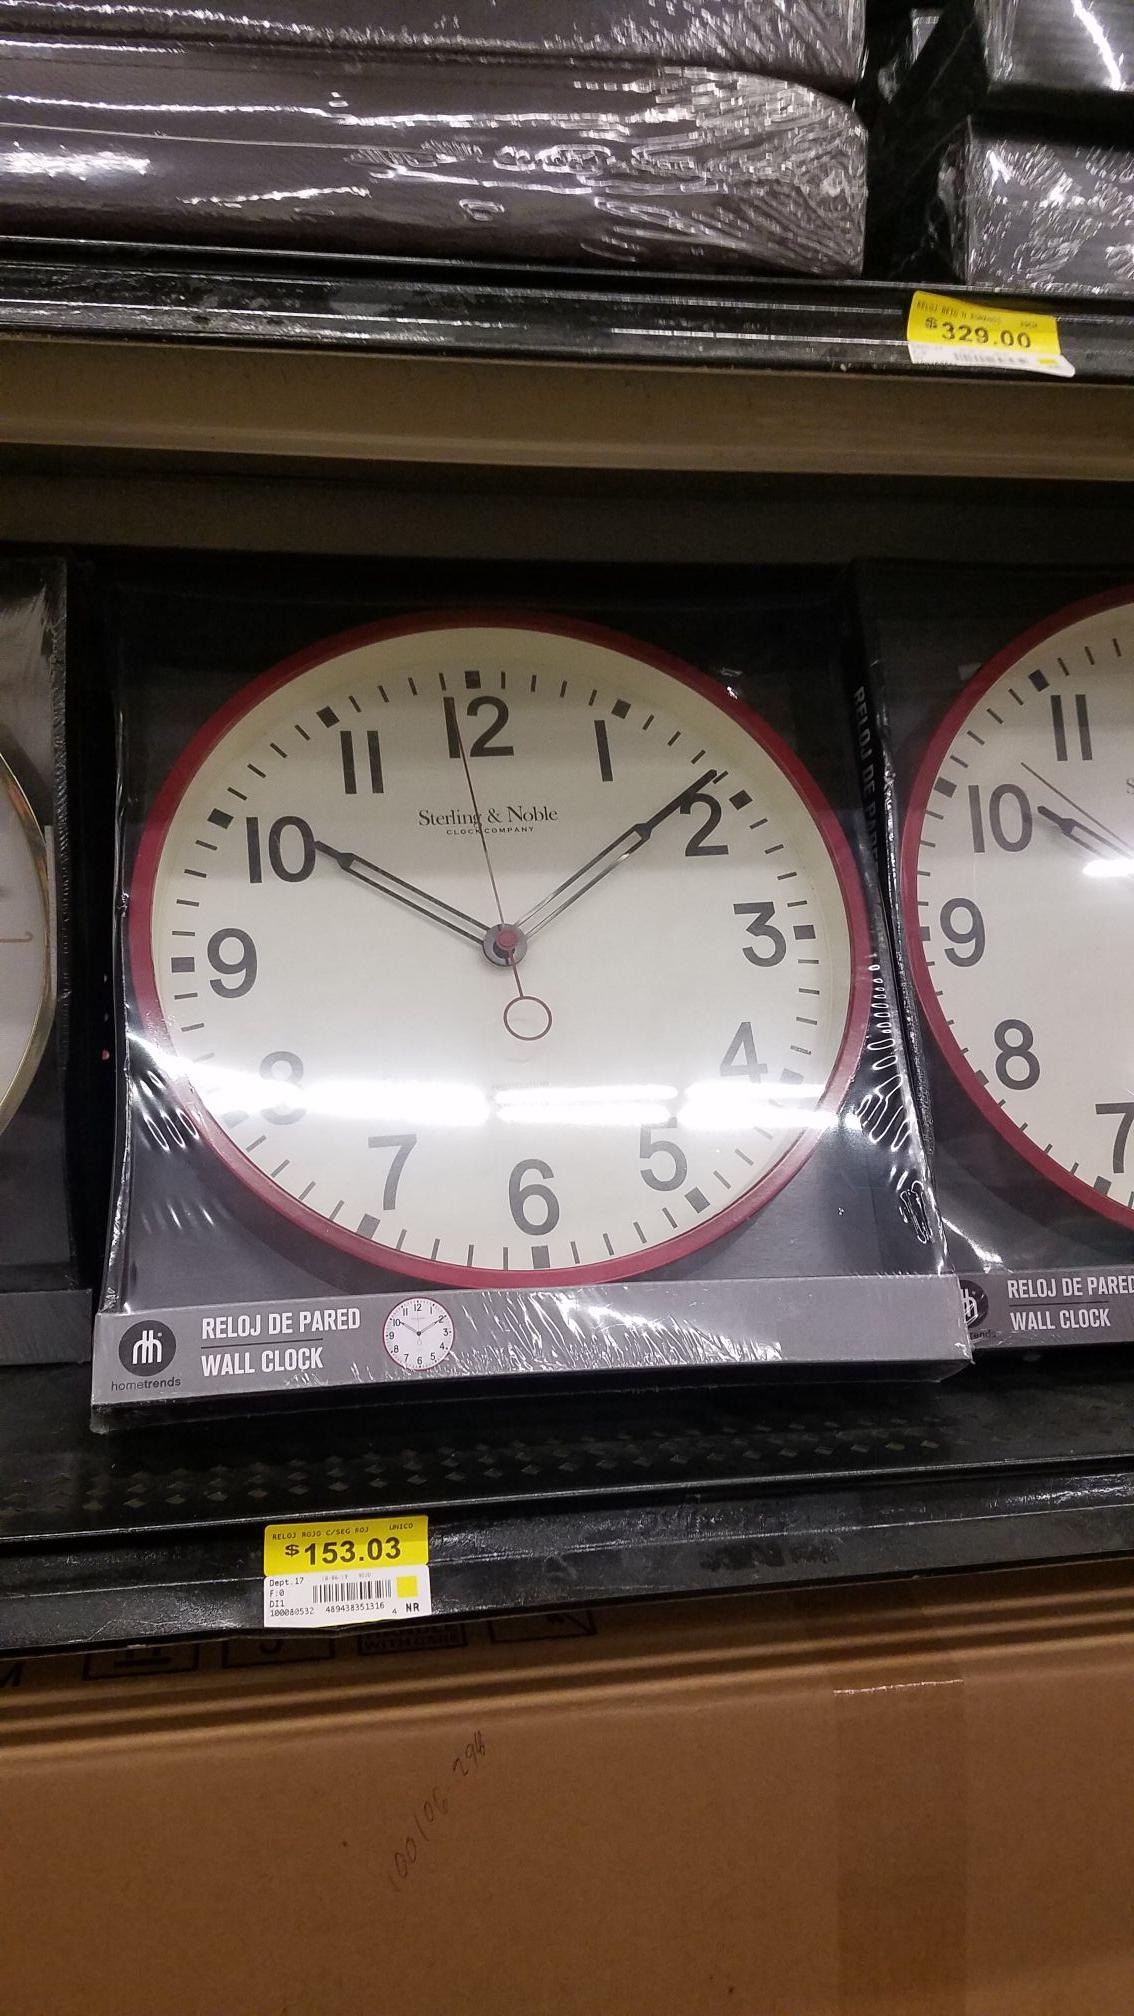 Walmart: Reloj de pared $153.03, Paquete 2 Passport scotch(700) y regaló 1 Wyborowa vodka(750) y follaje